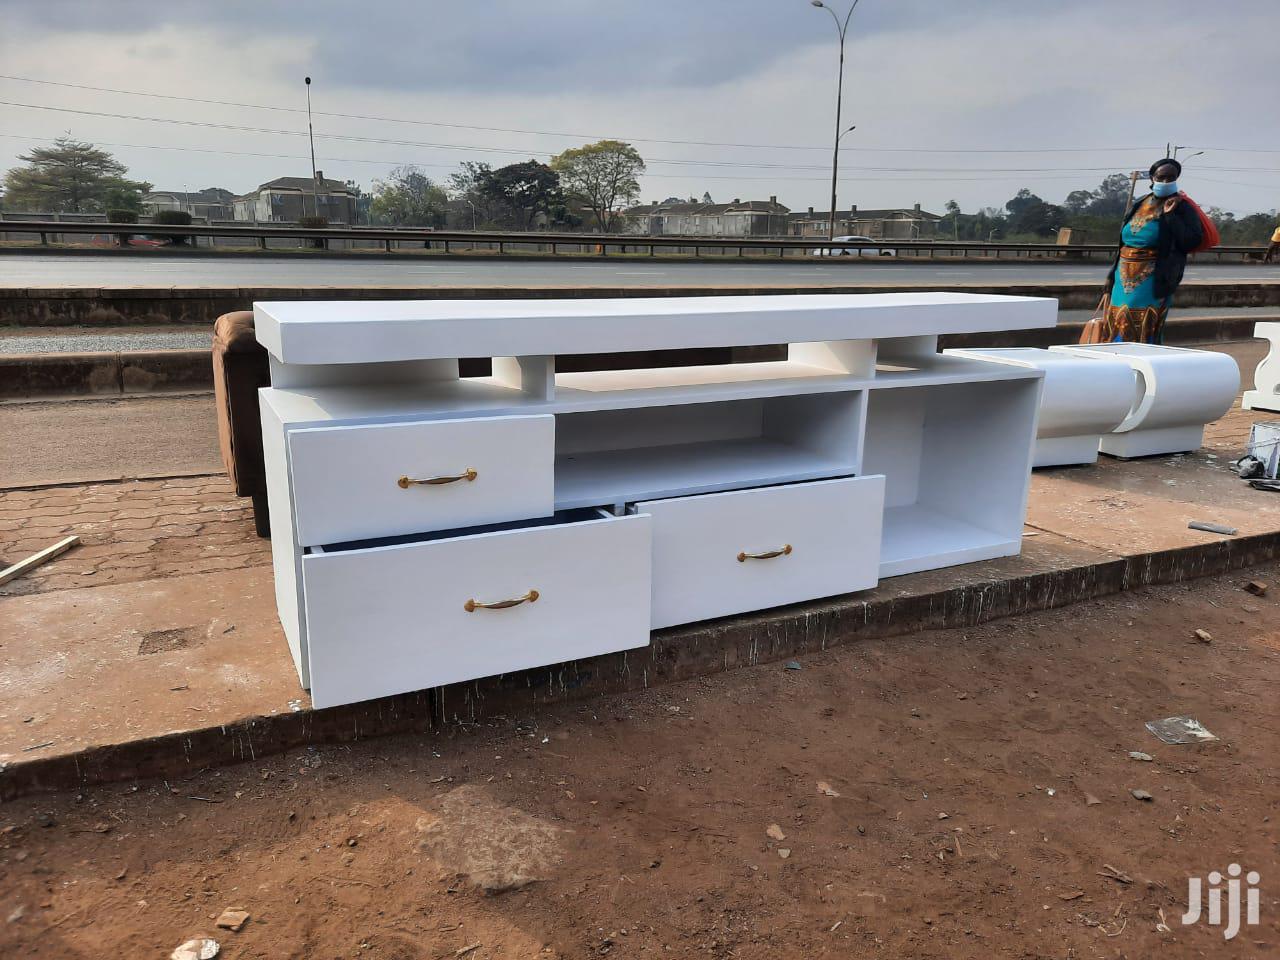 Tv Stands. | Furniture for sale in Kahawa, Nairobi, Kenya